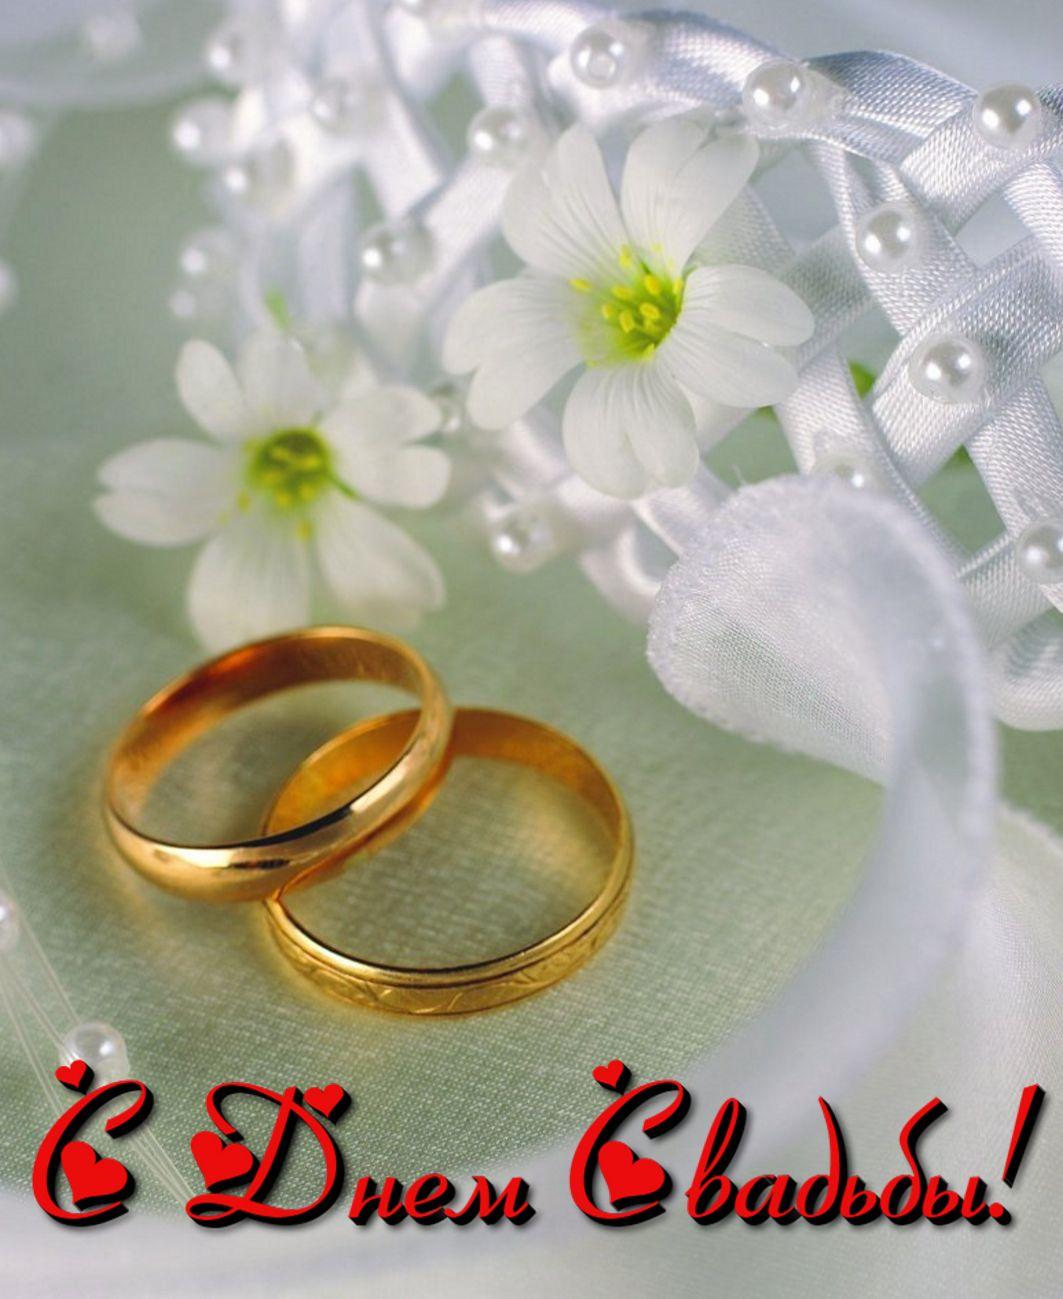 Мужа, свадебные открытки с фото онлайн